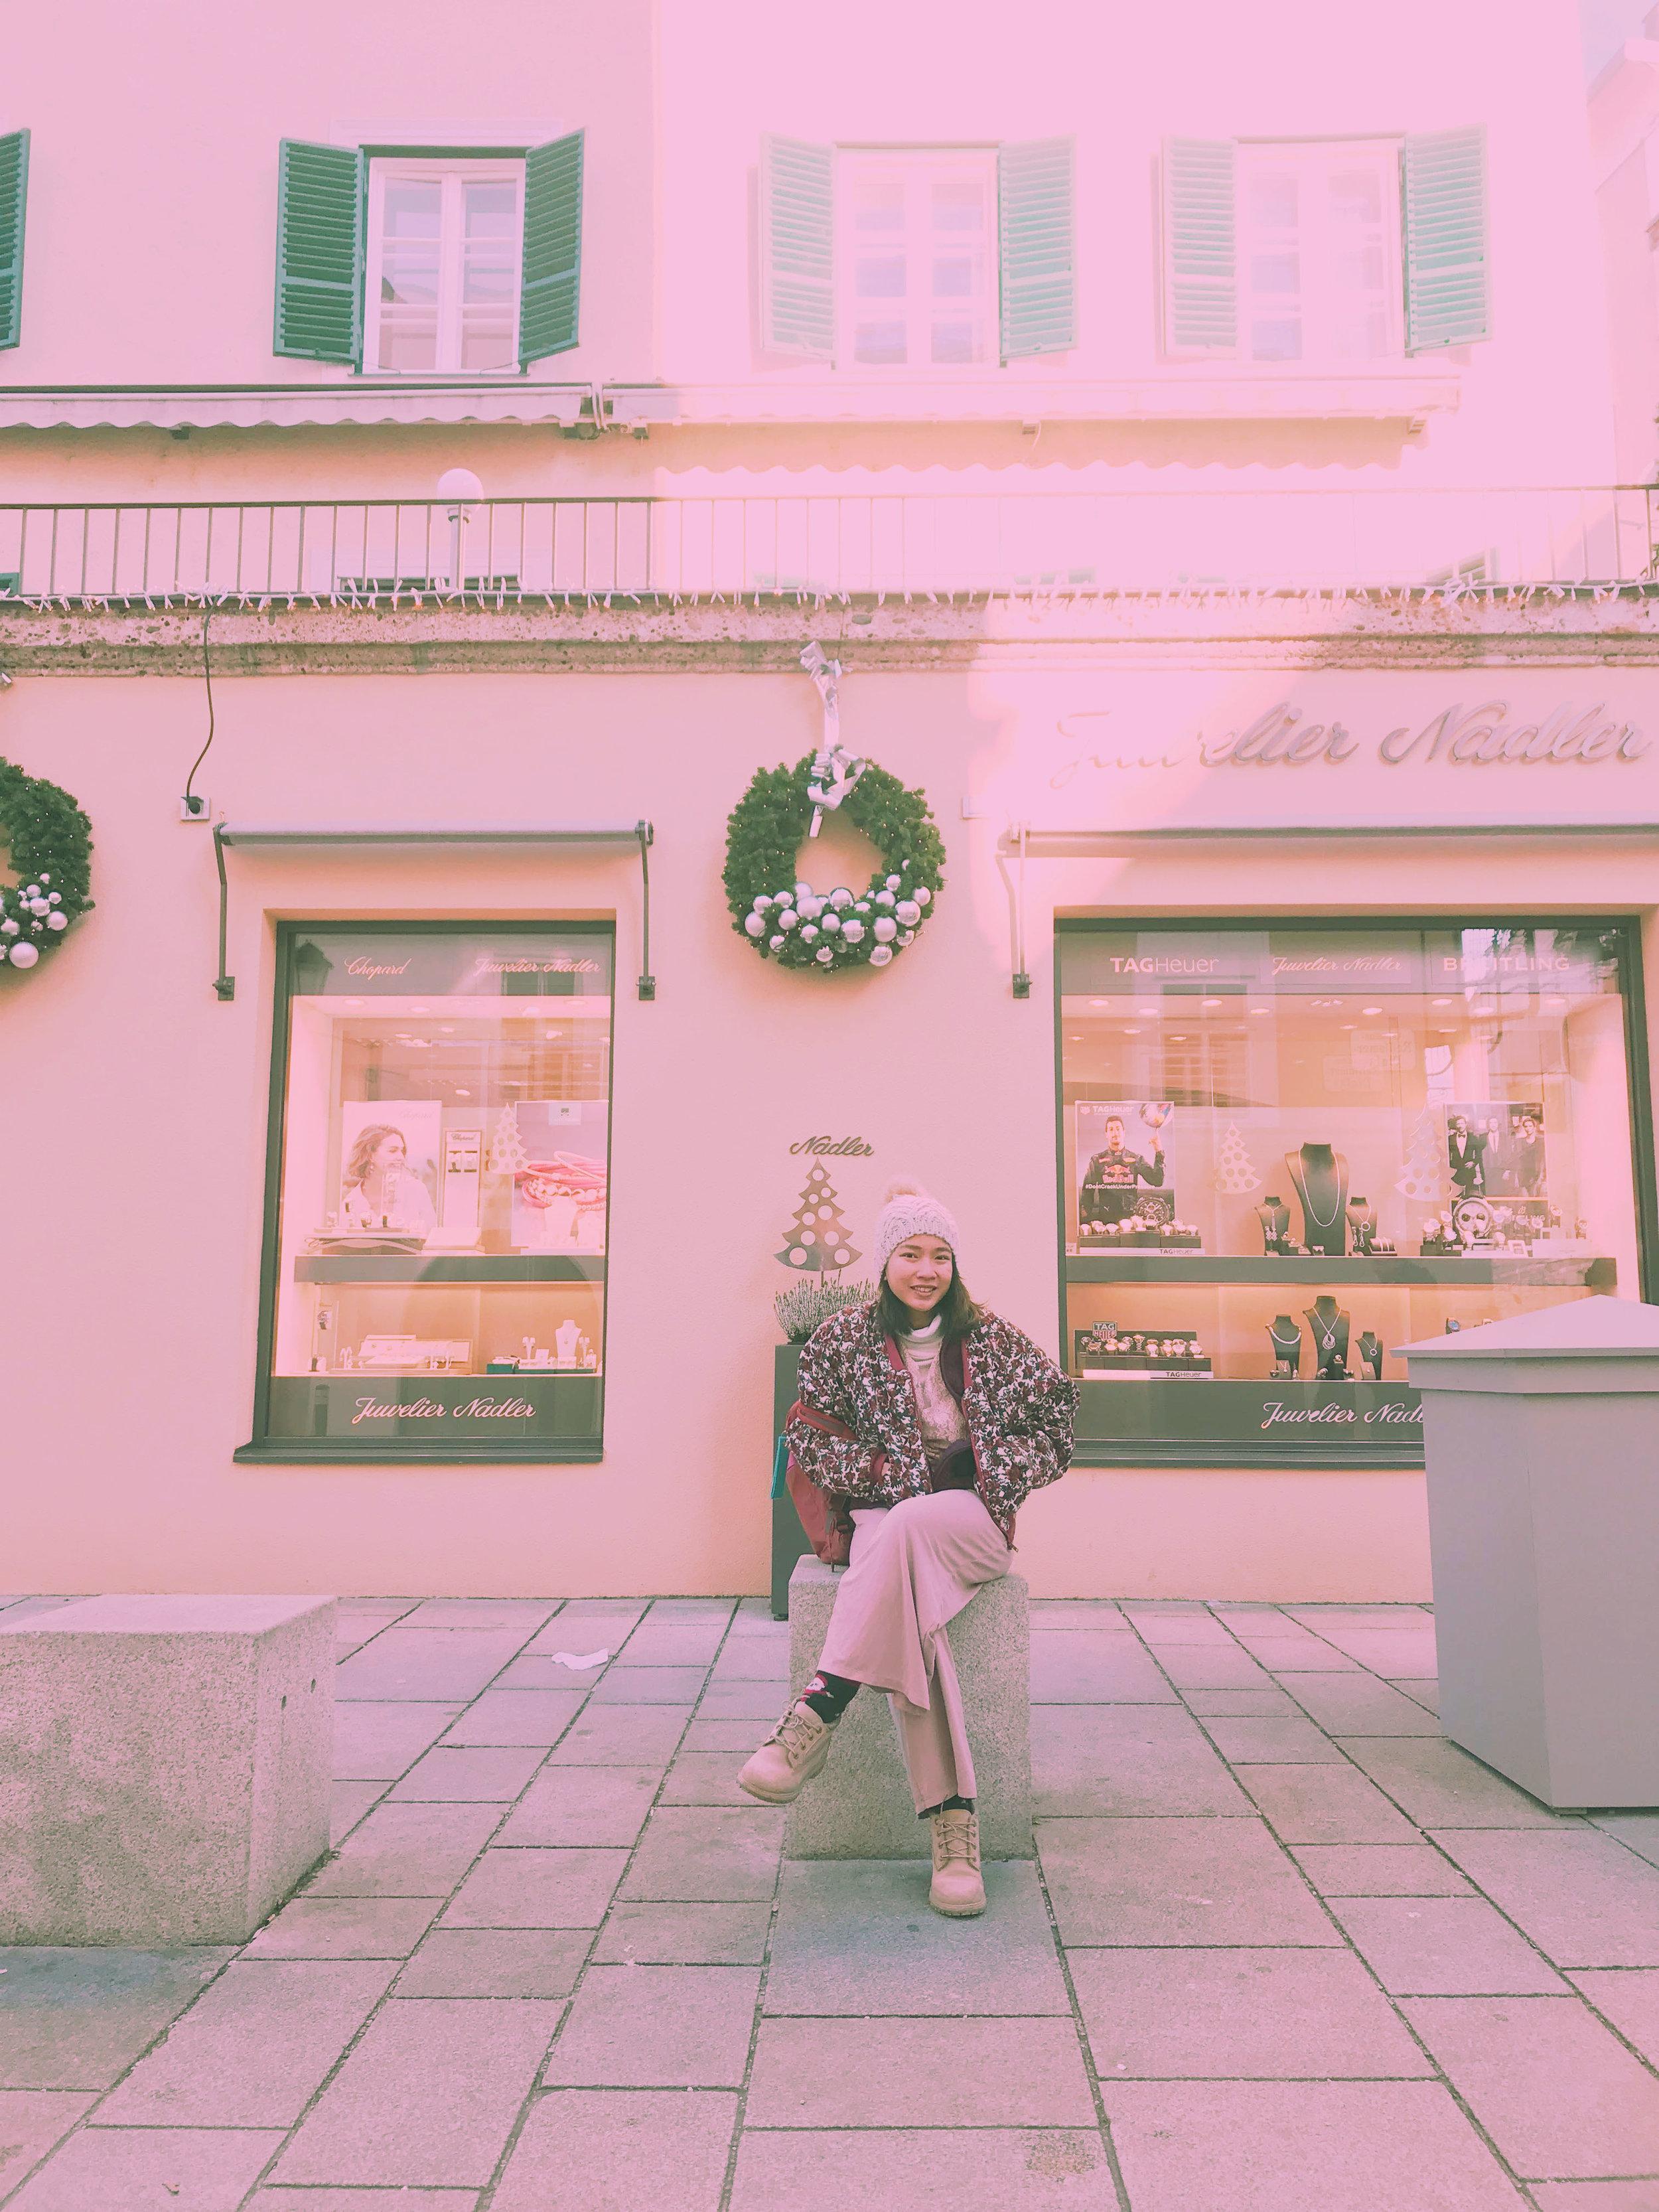 Salzburg1+Preset.jpg